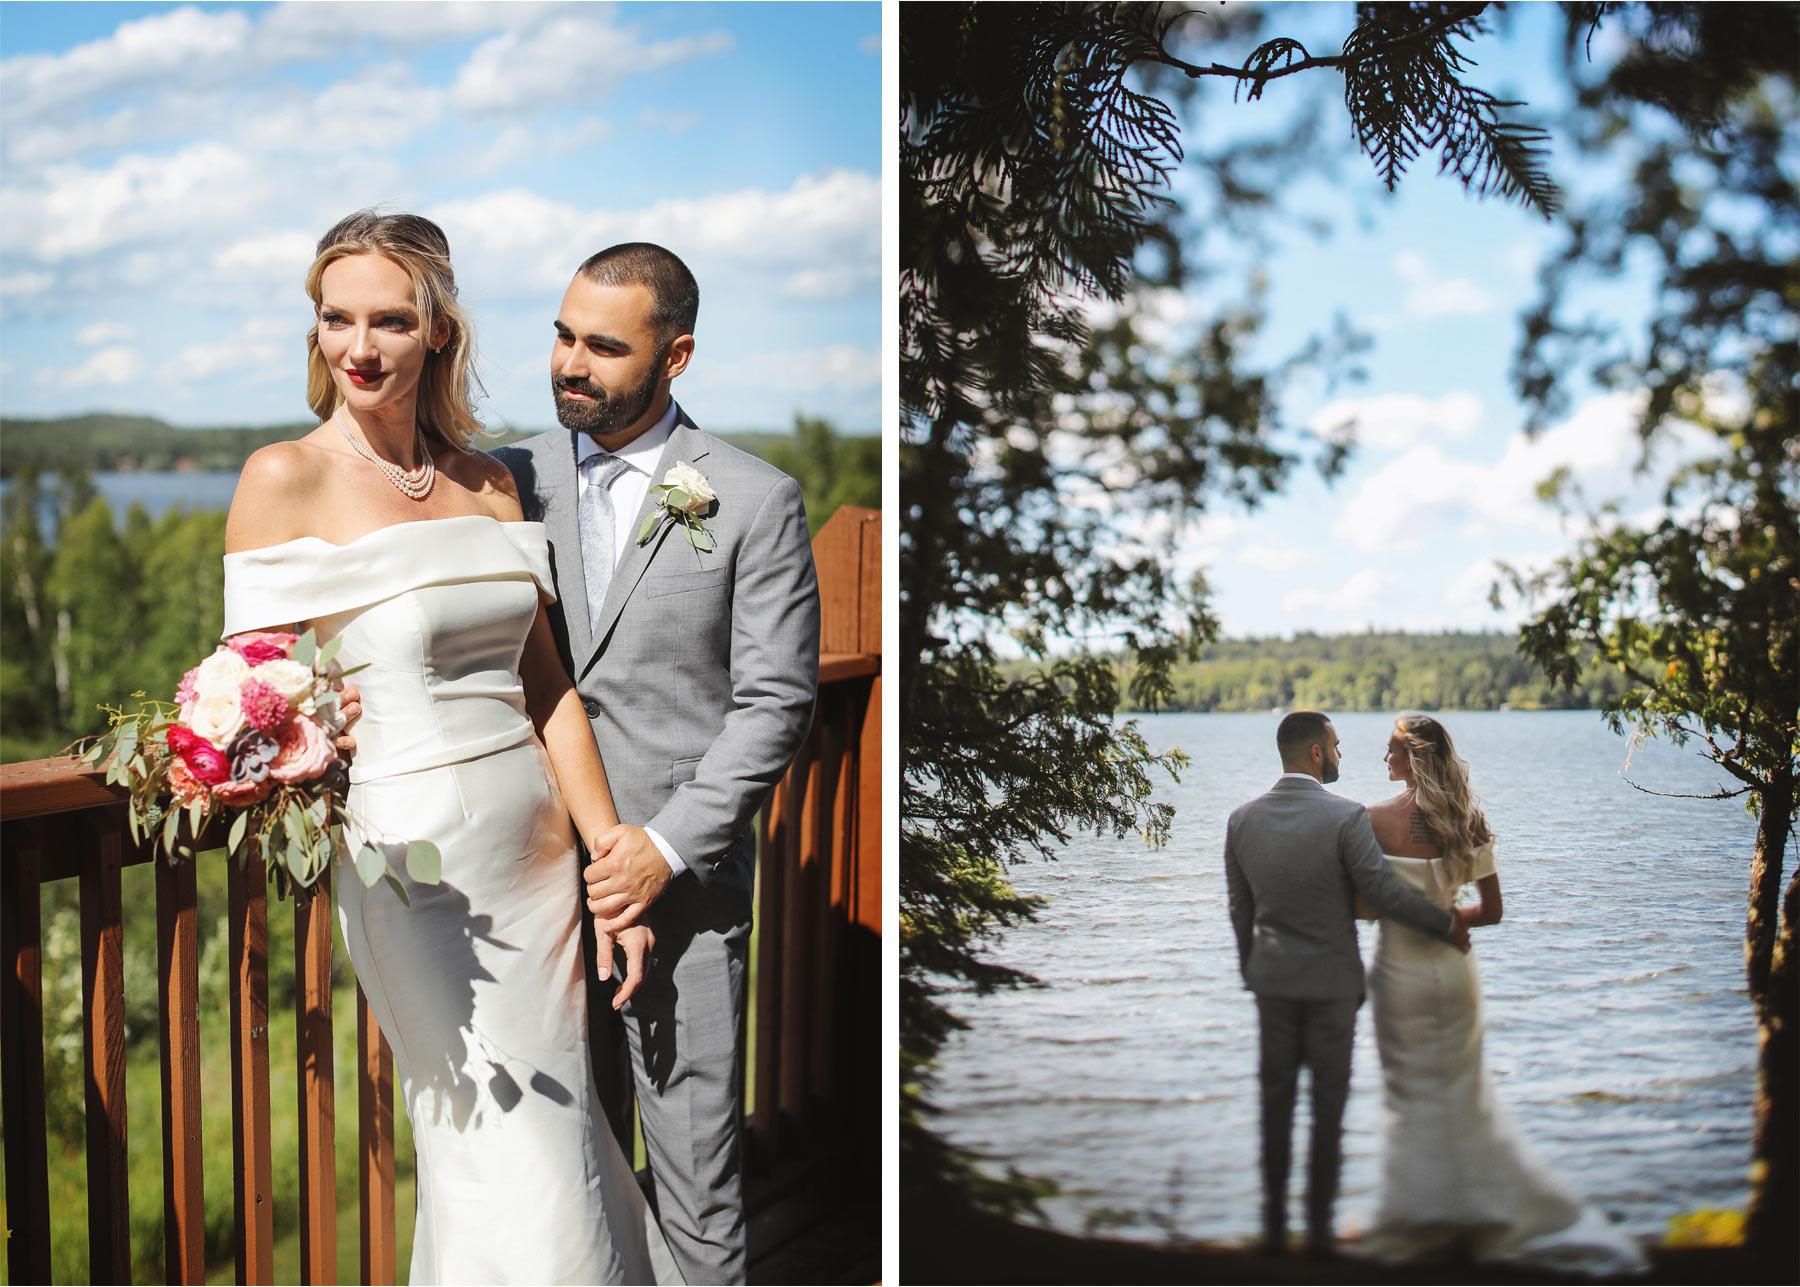 15-Ely-Minnesota-North-Wedding-by-Andrew-Vick-Photography-Lake-Beach-Bride-Groom-Katie-and-Joe.jpg